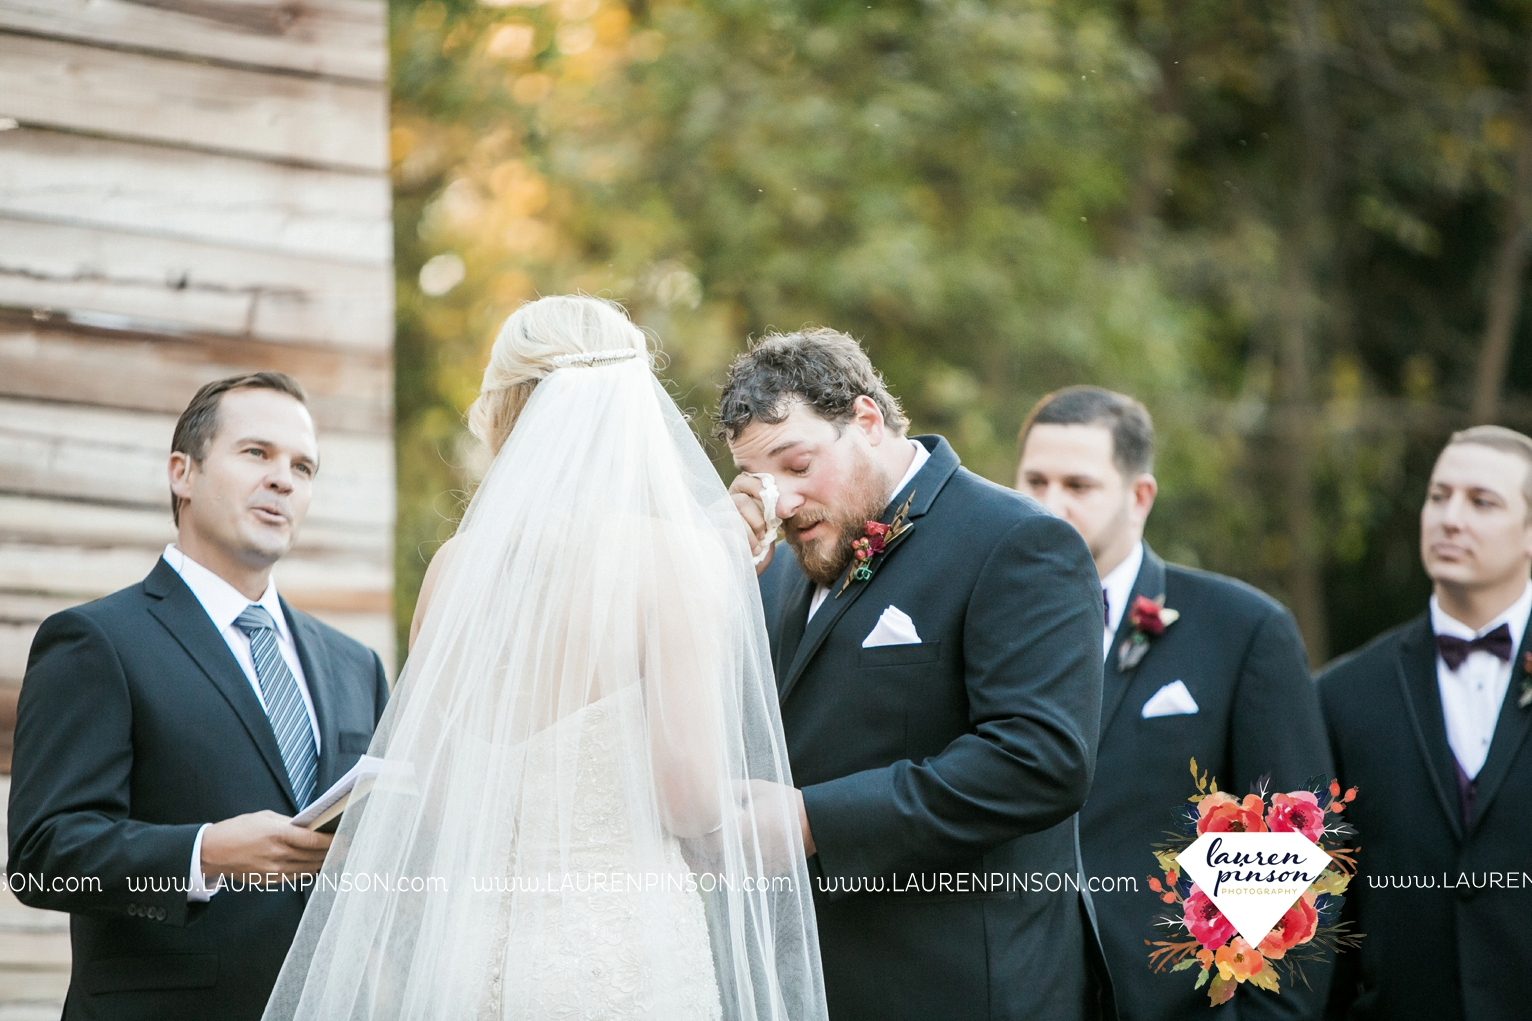 rustic-wichita-falls-texas-wedding-photographer-gold-glam-mayfield-events-market-street-united-allue-bridals-fall_1683.jpg